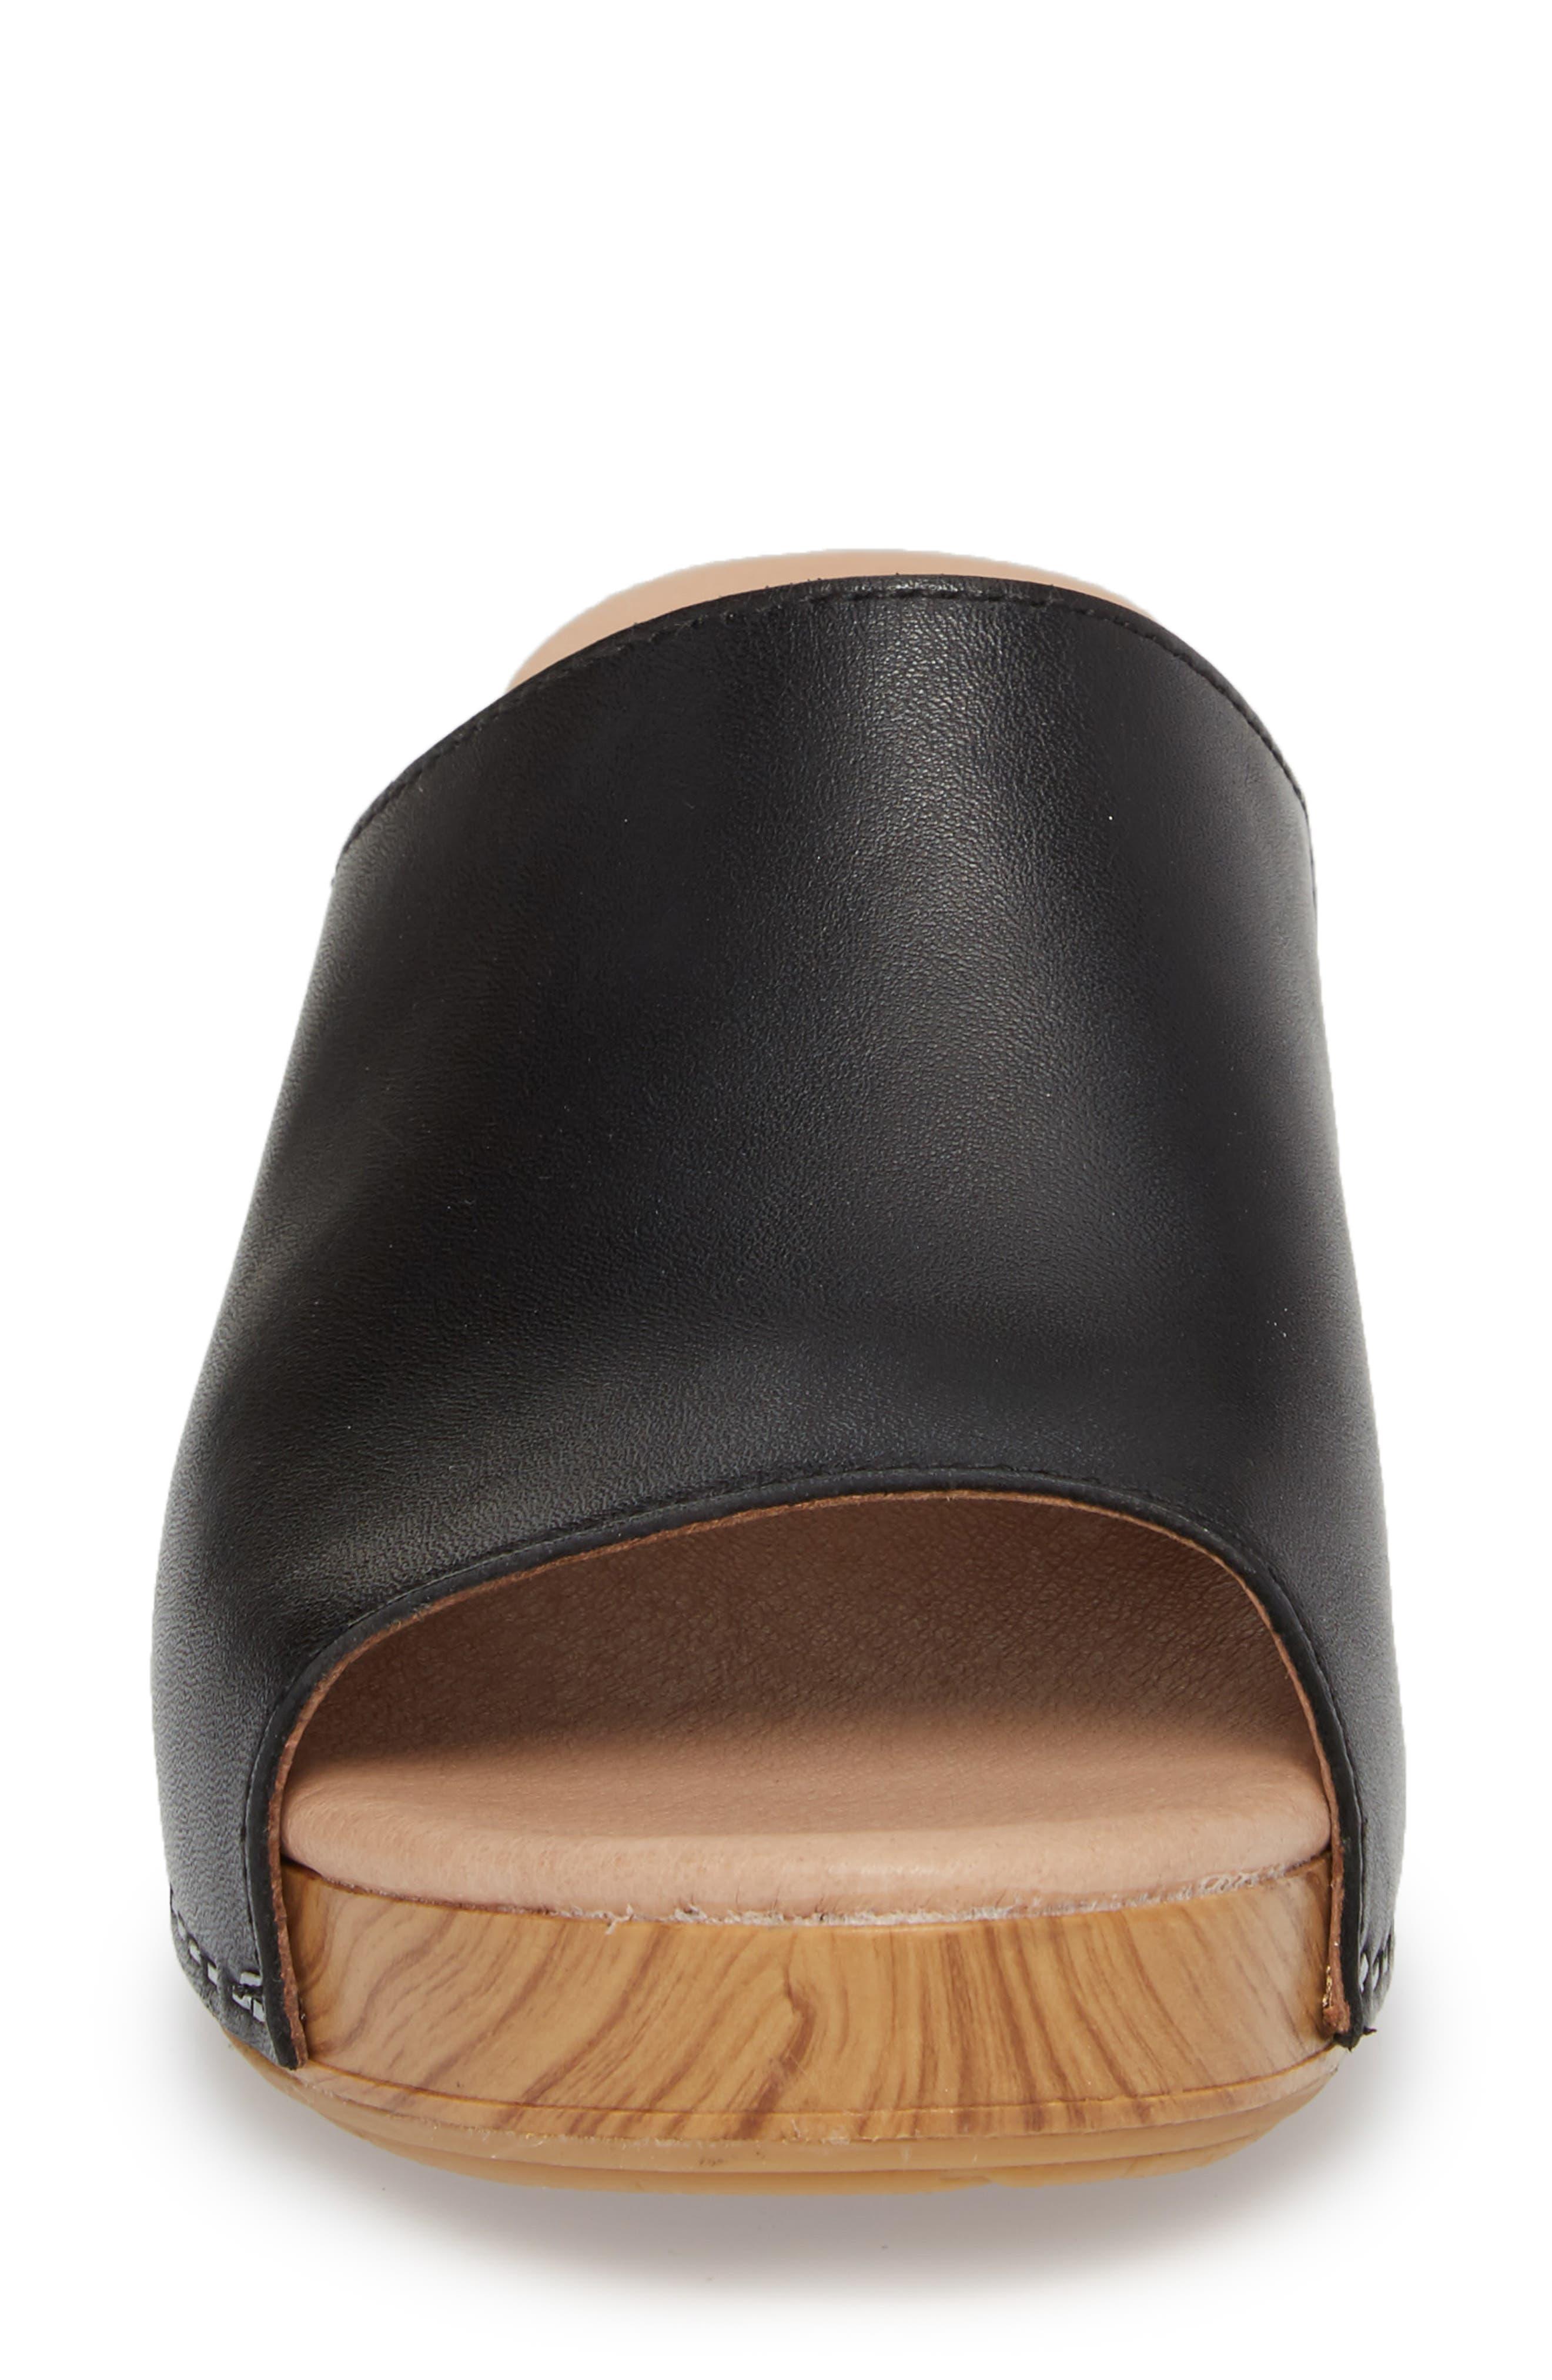 Maci Mule Sandal,                             Alternate thumbnail 4, color,                             BLACK LEATHER